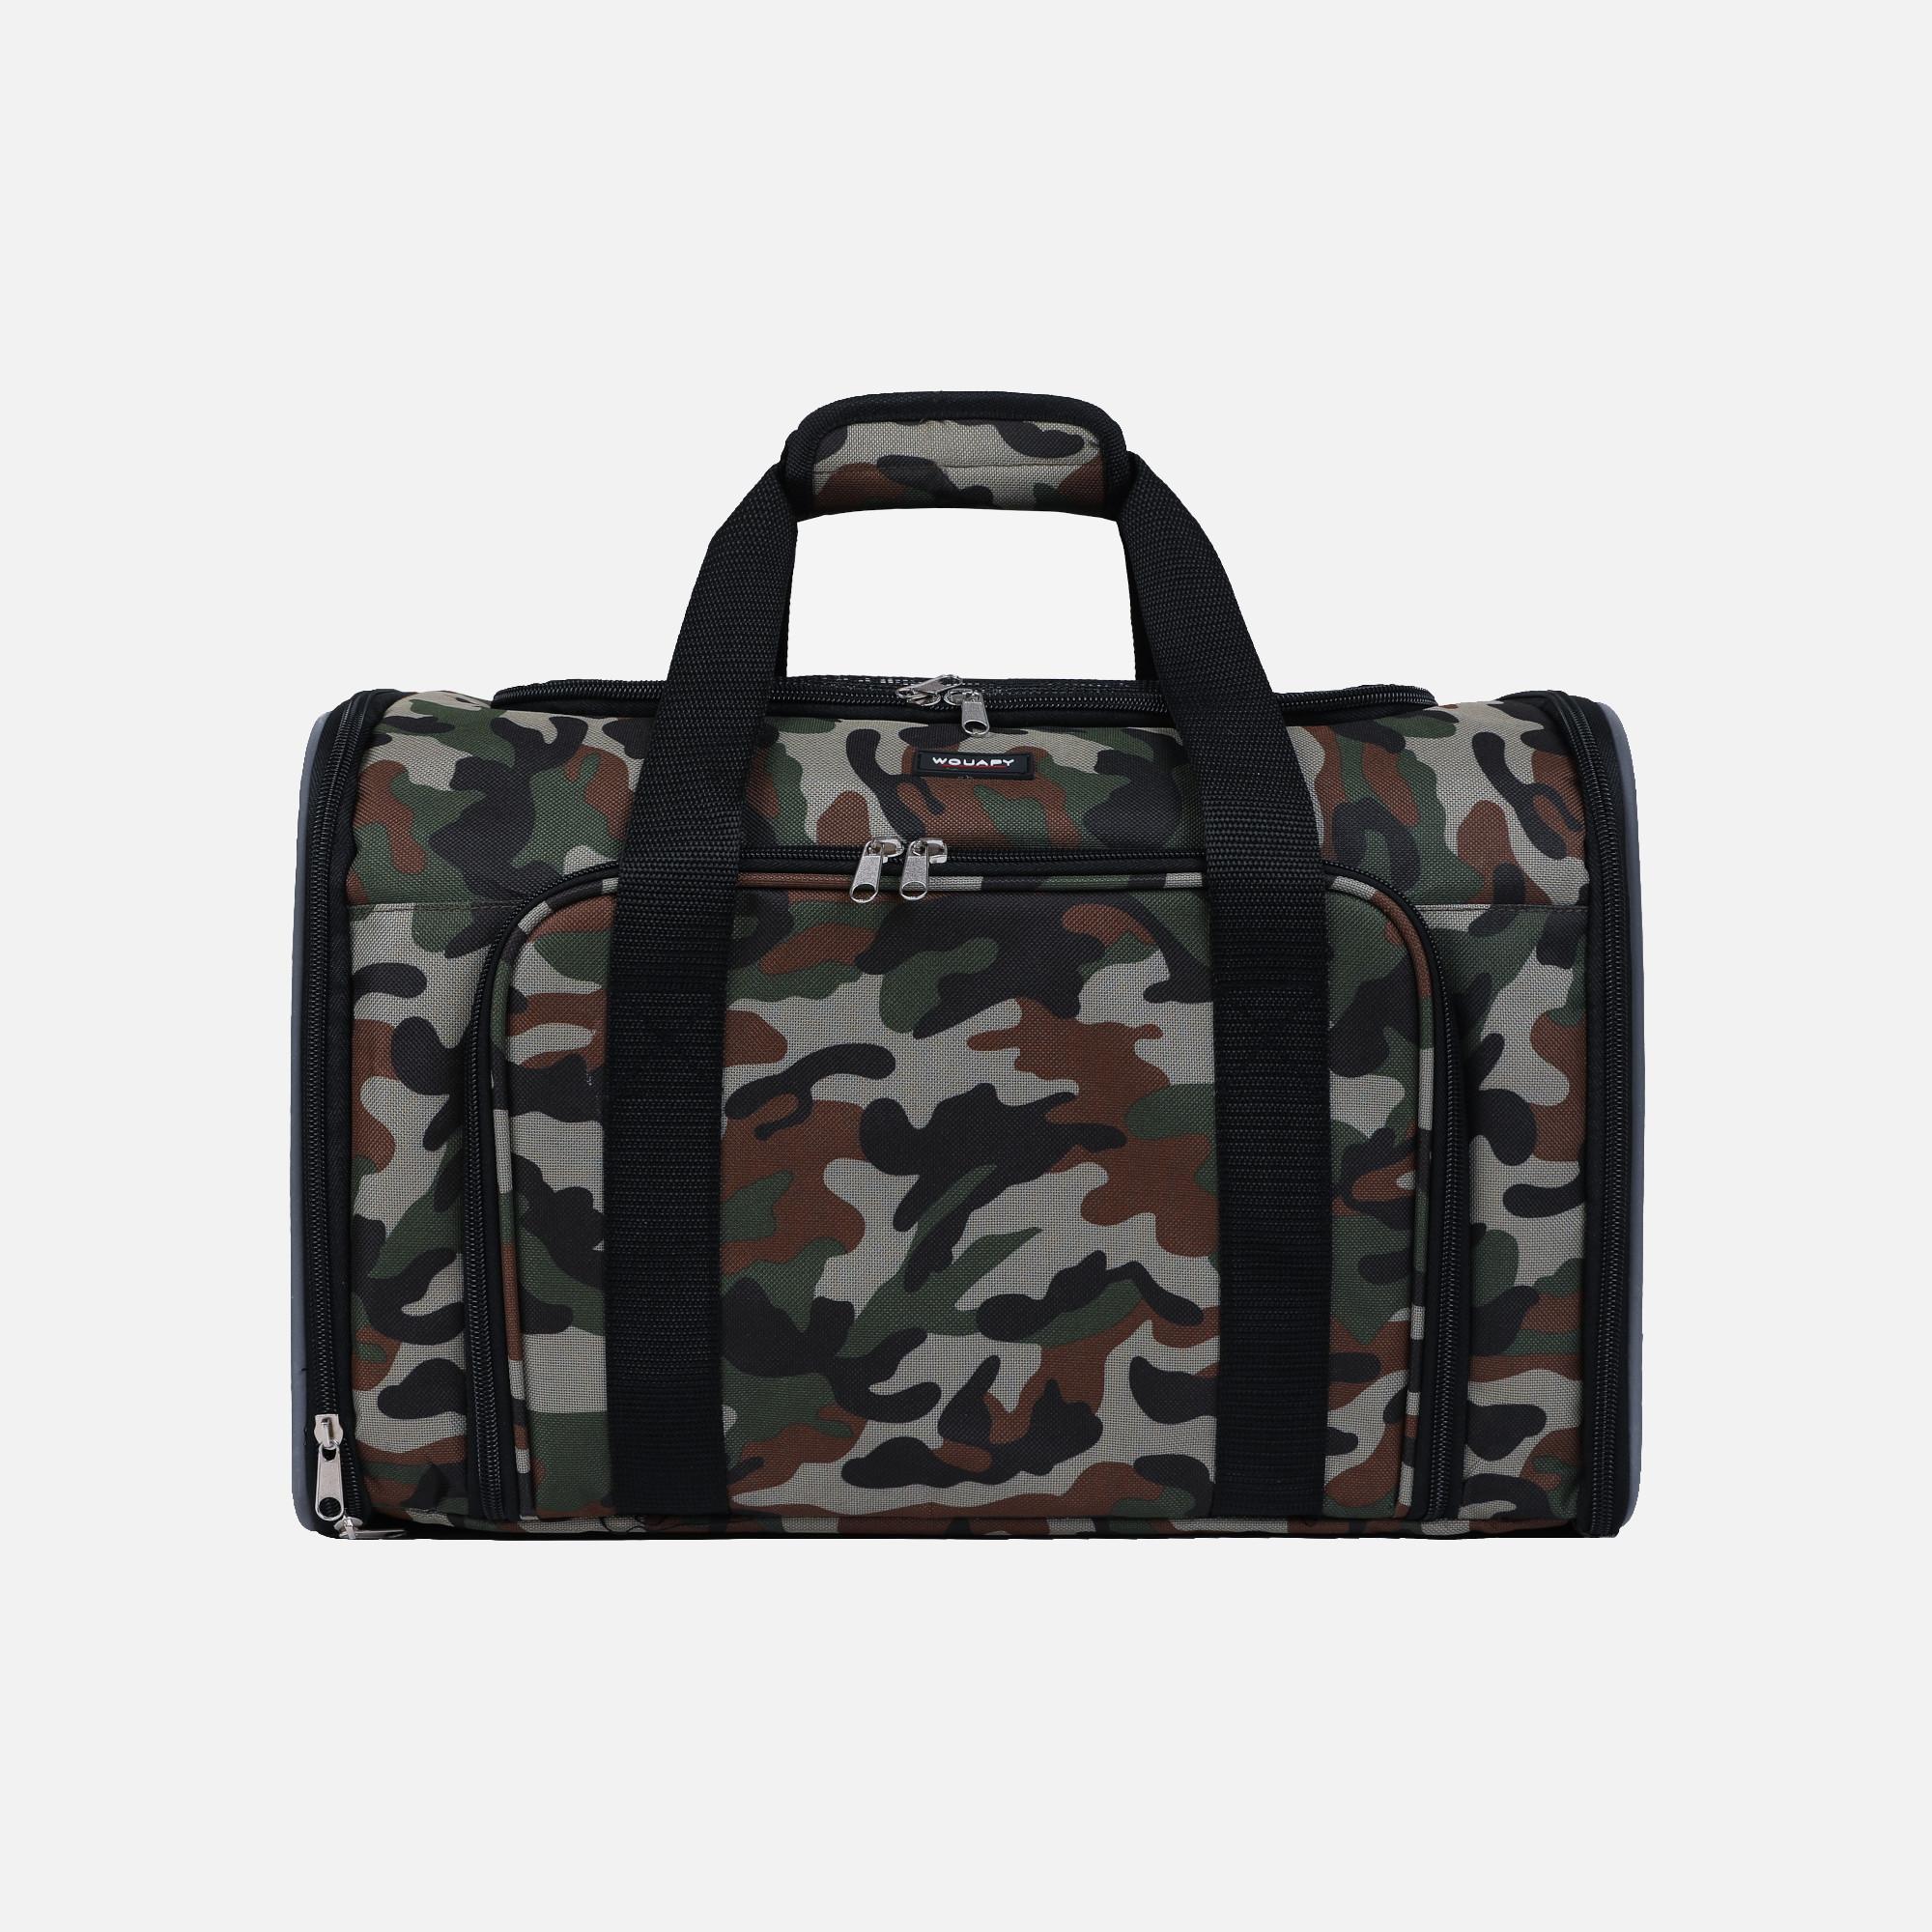 Sac camping camouflage par Wouapy